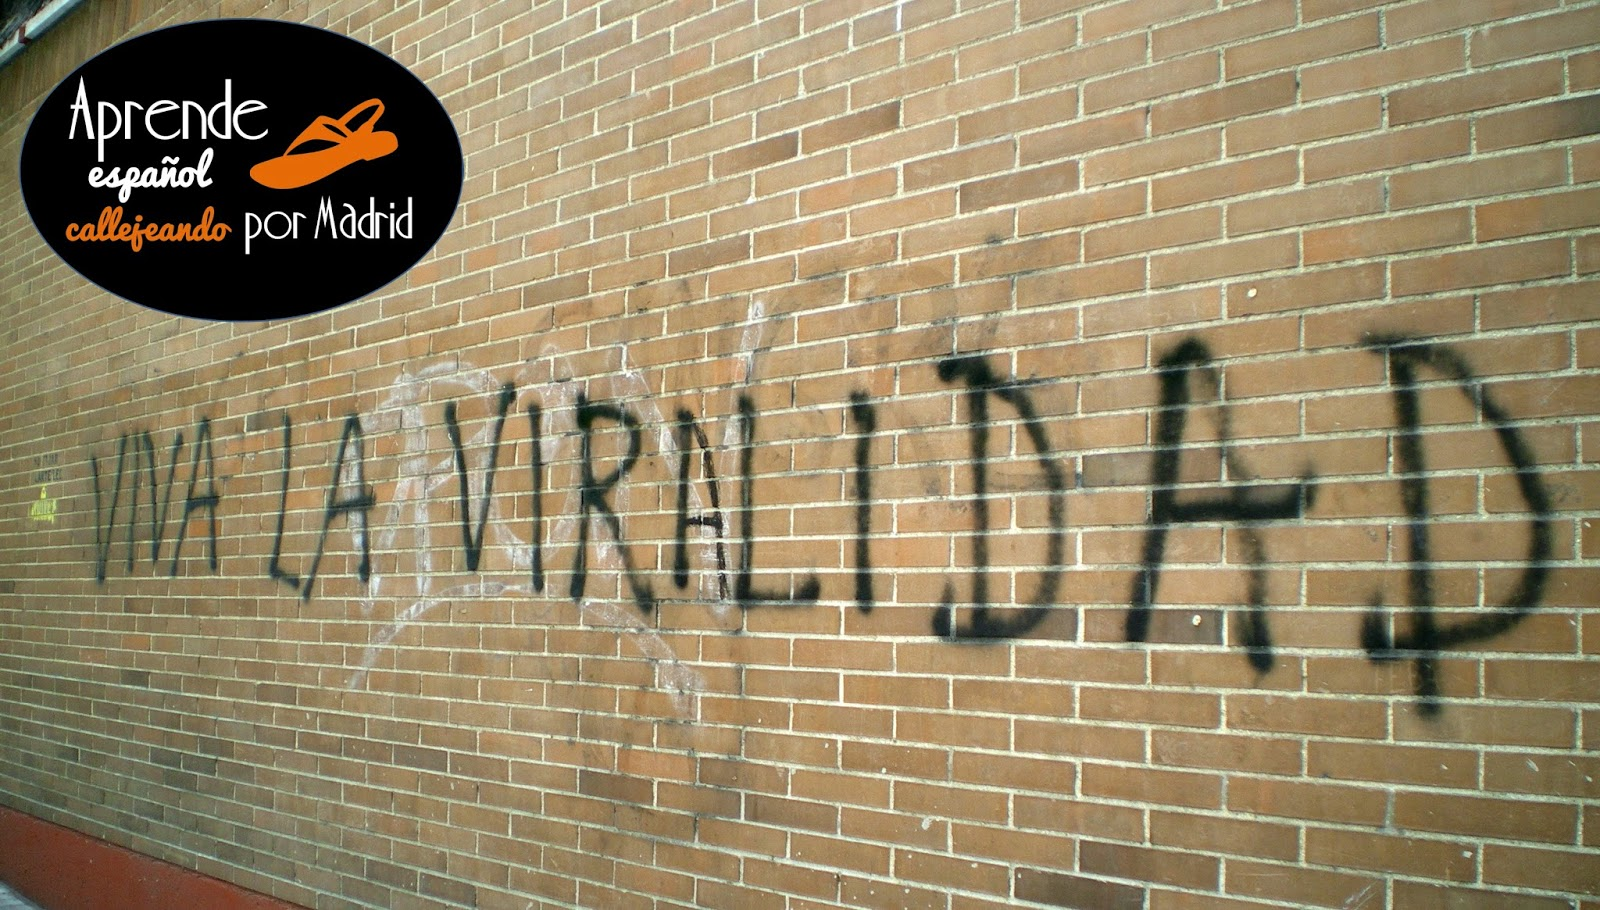 viva la viralidad